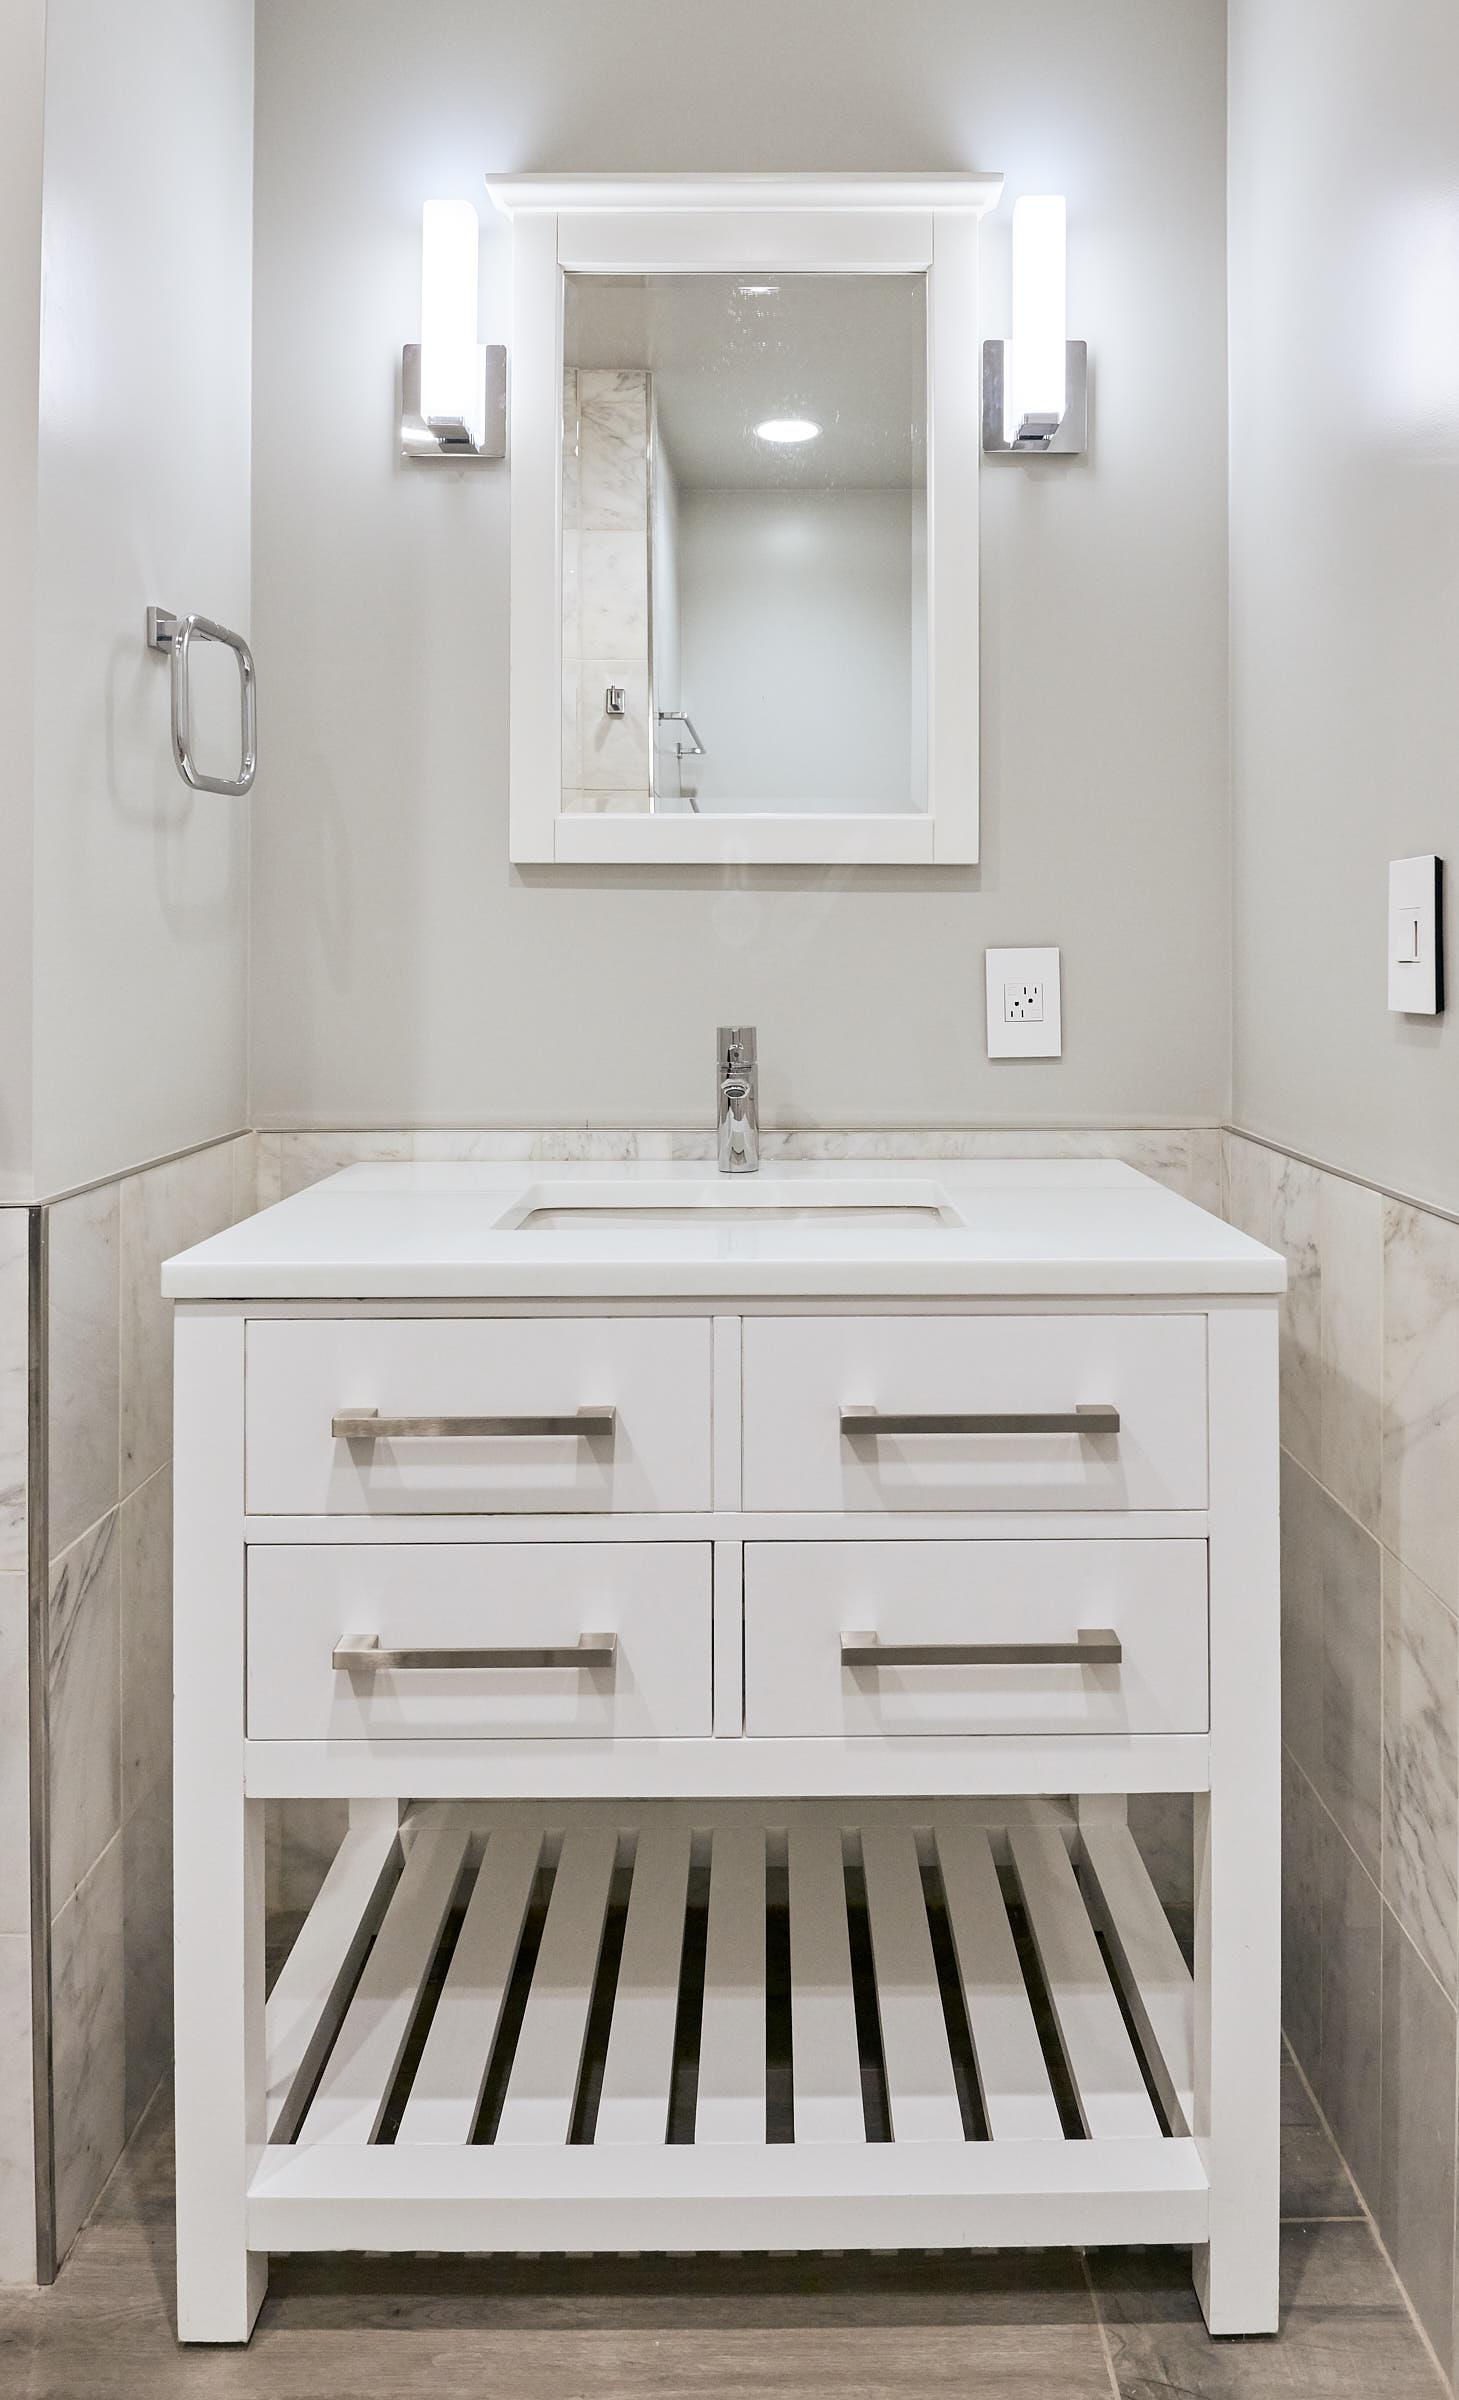 White Carrera Marble tiles, White Quartz Counter, White Cabinet all make for a classic bathroom.